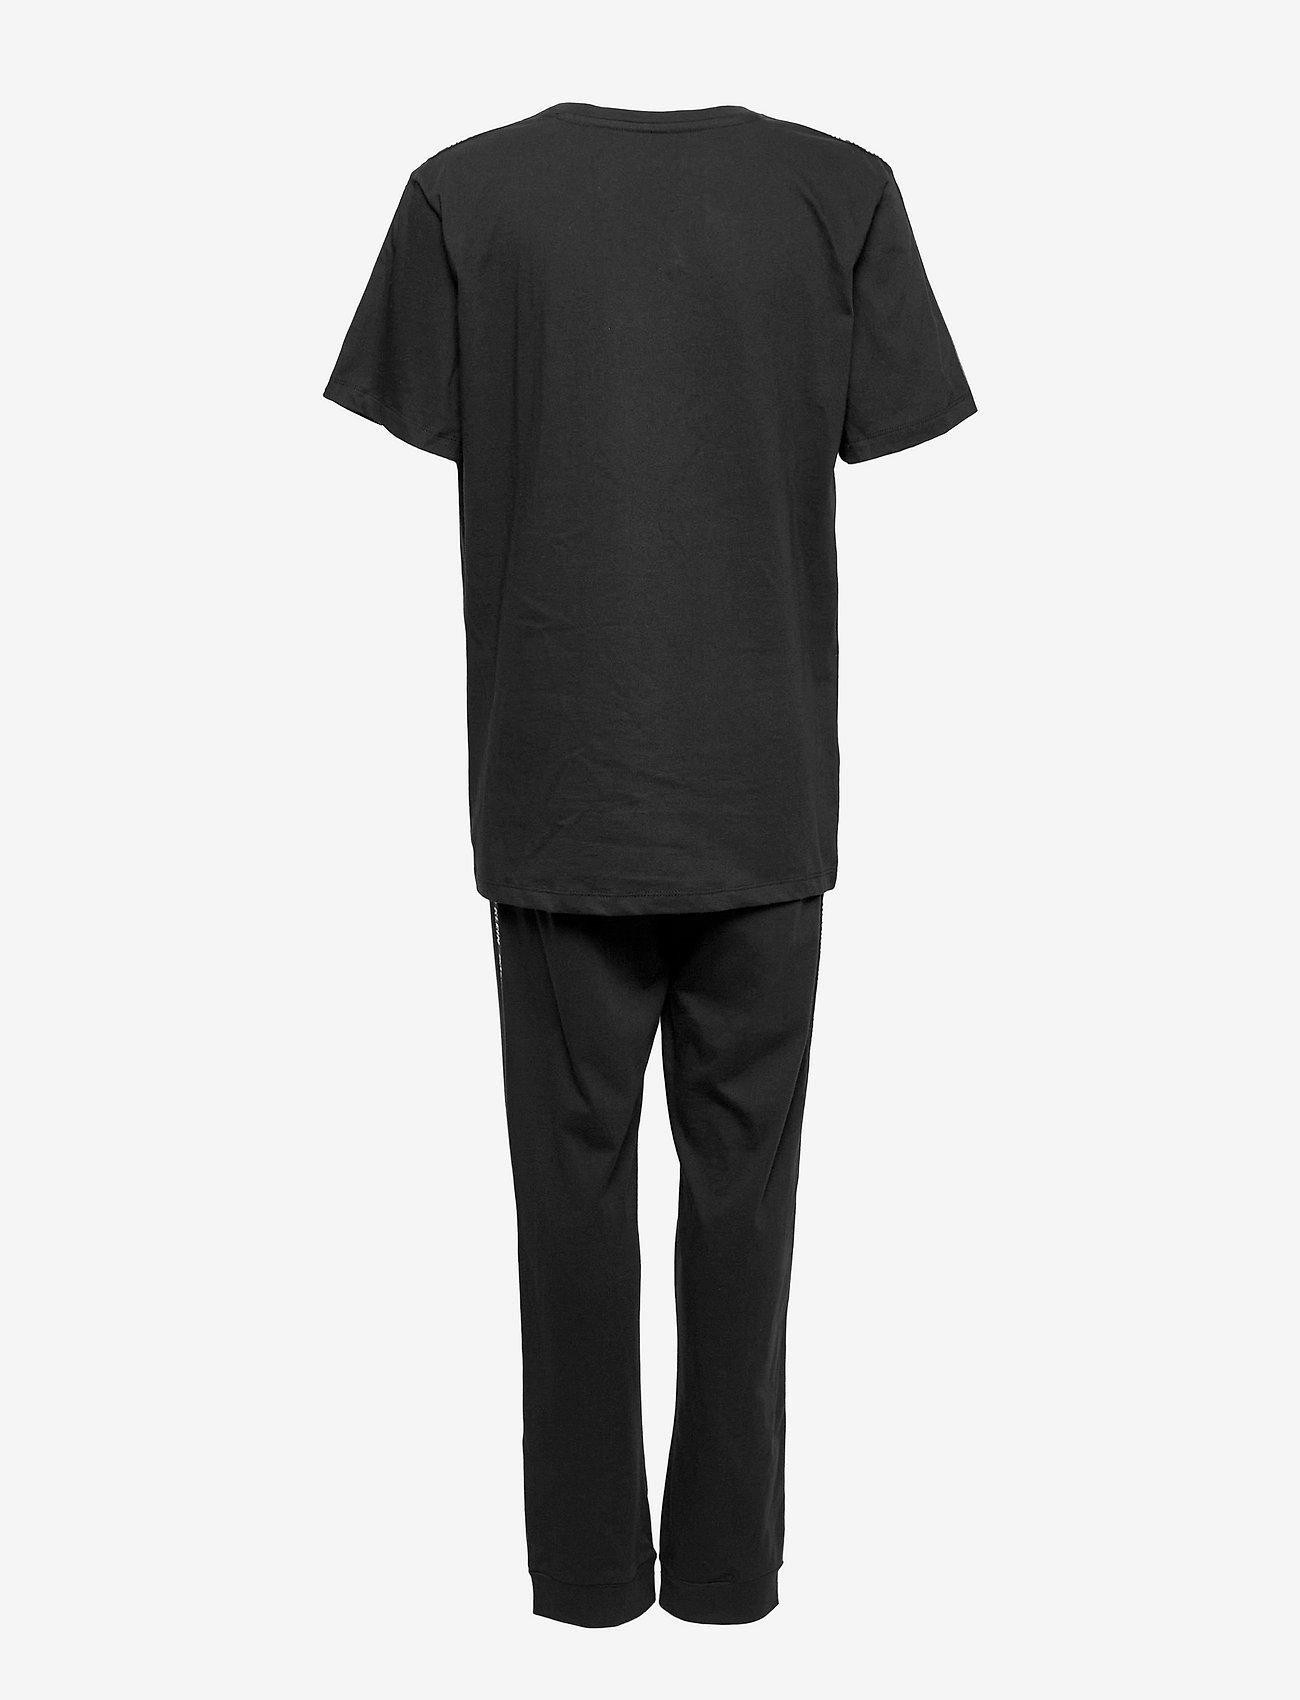 Calvin Klein - KNIT PJ SET (SS+CUFFED PANT) - sæt - pvh black - 1